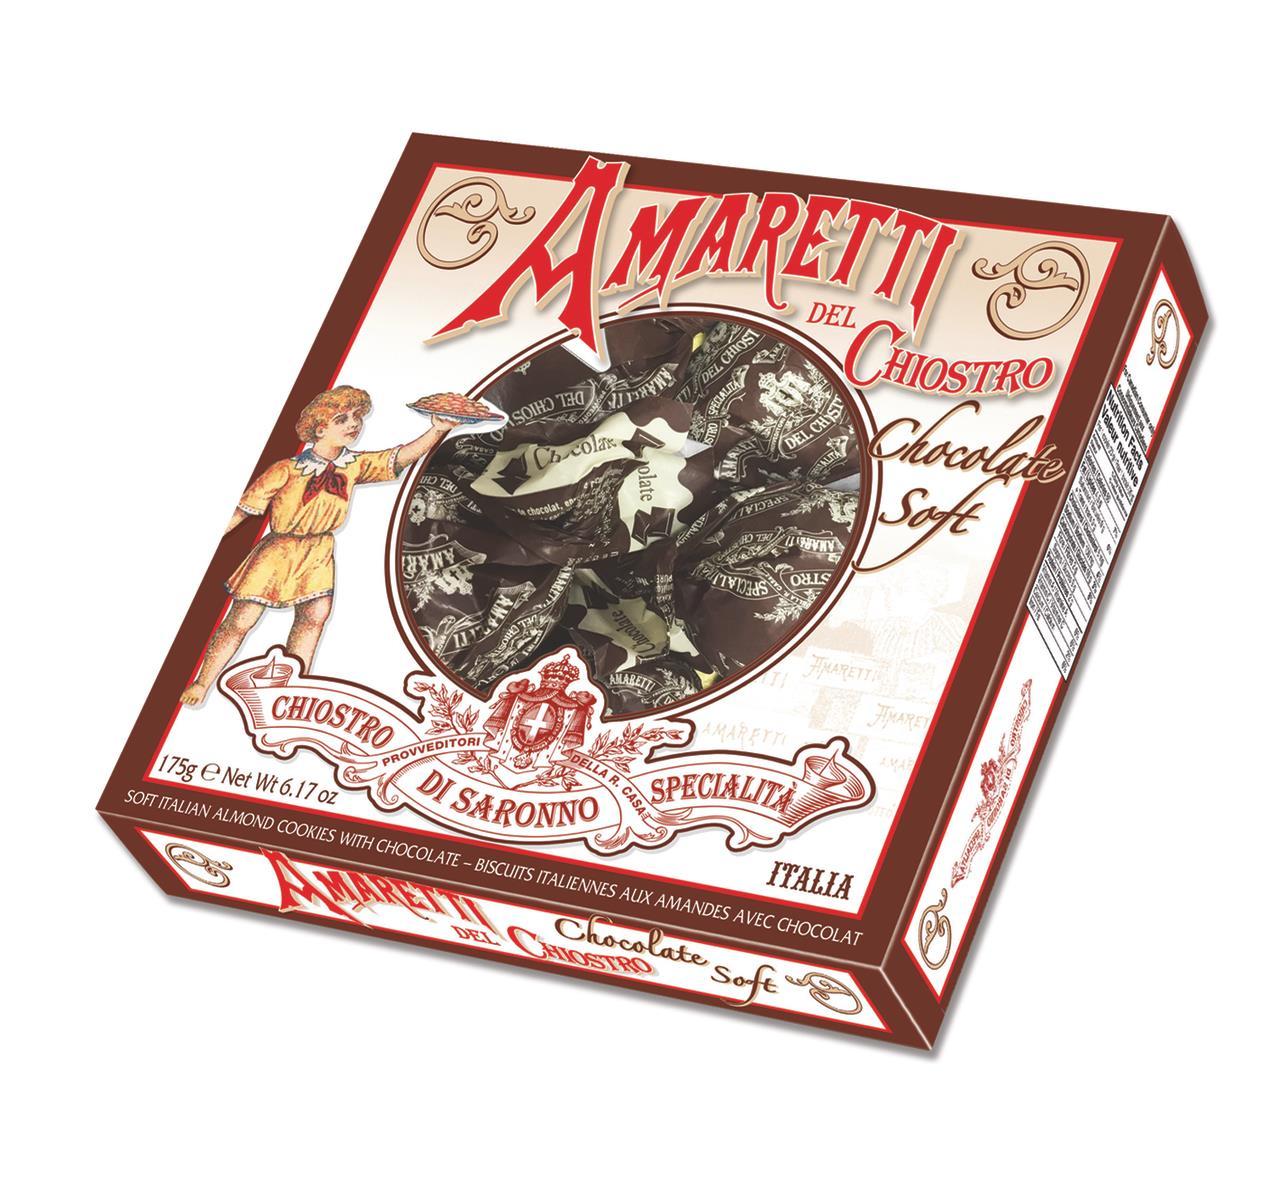 Печенье CHIOSTRO DI SARONNO амарэт с шоколадом, 175 г